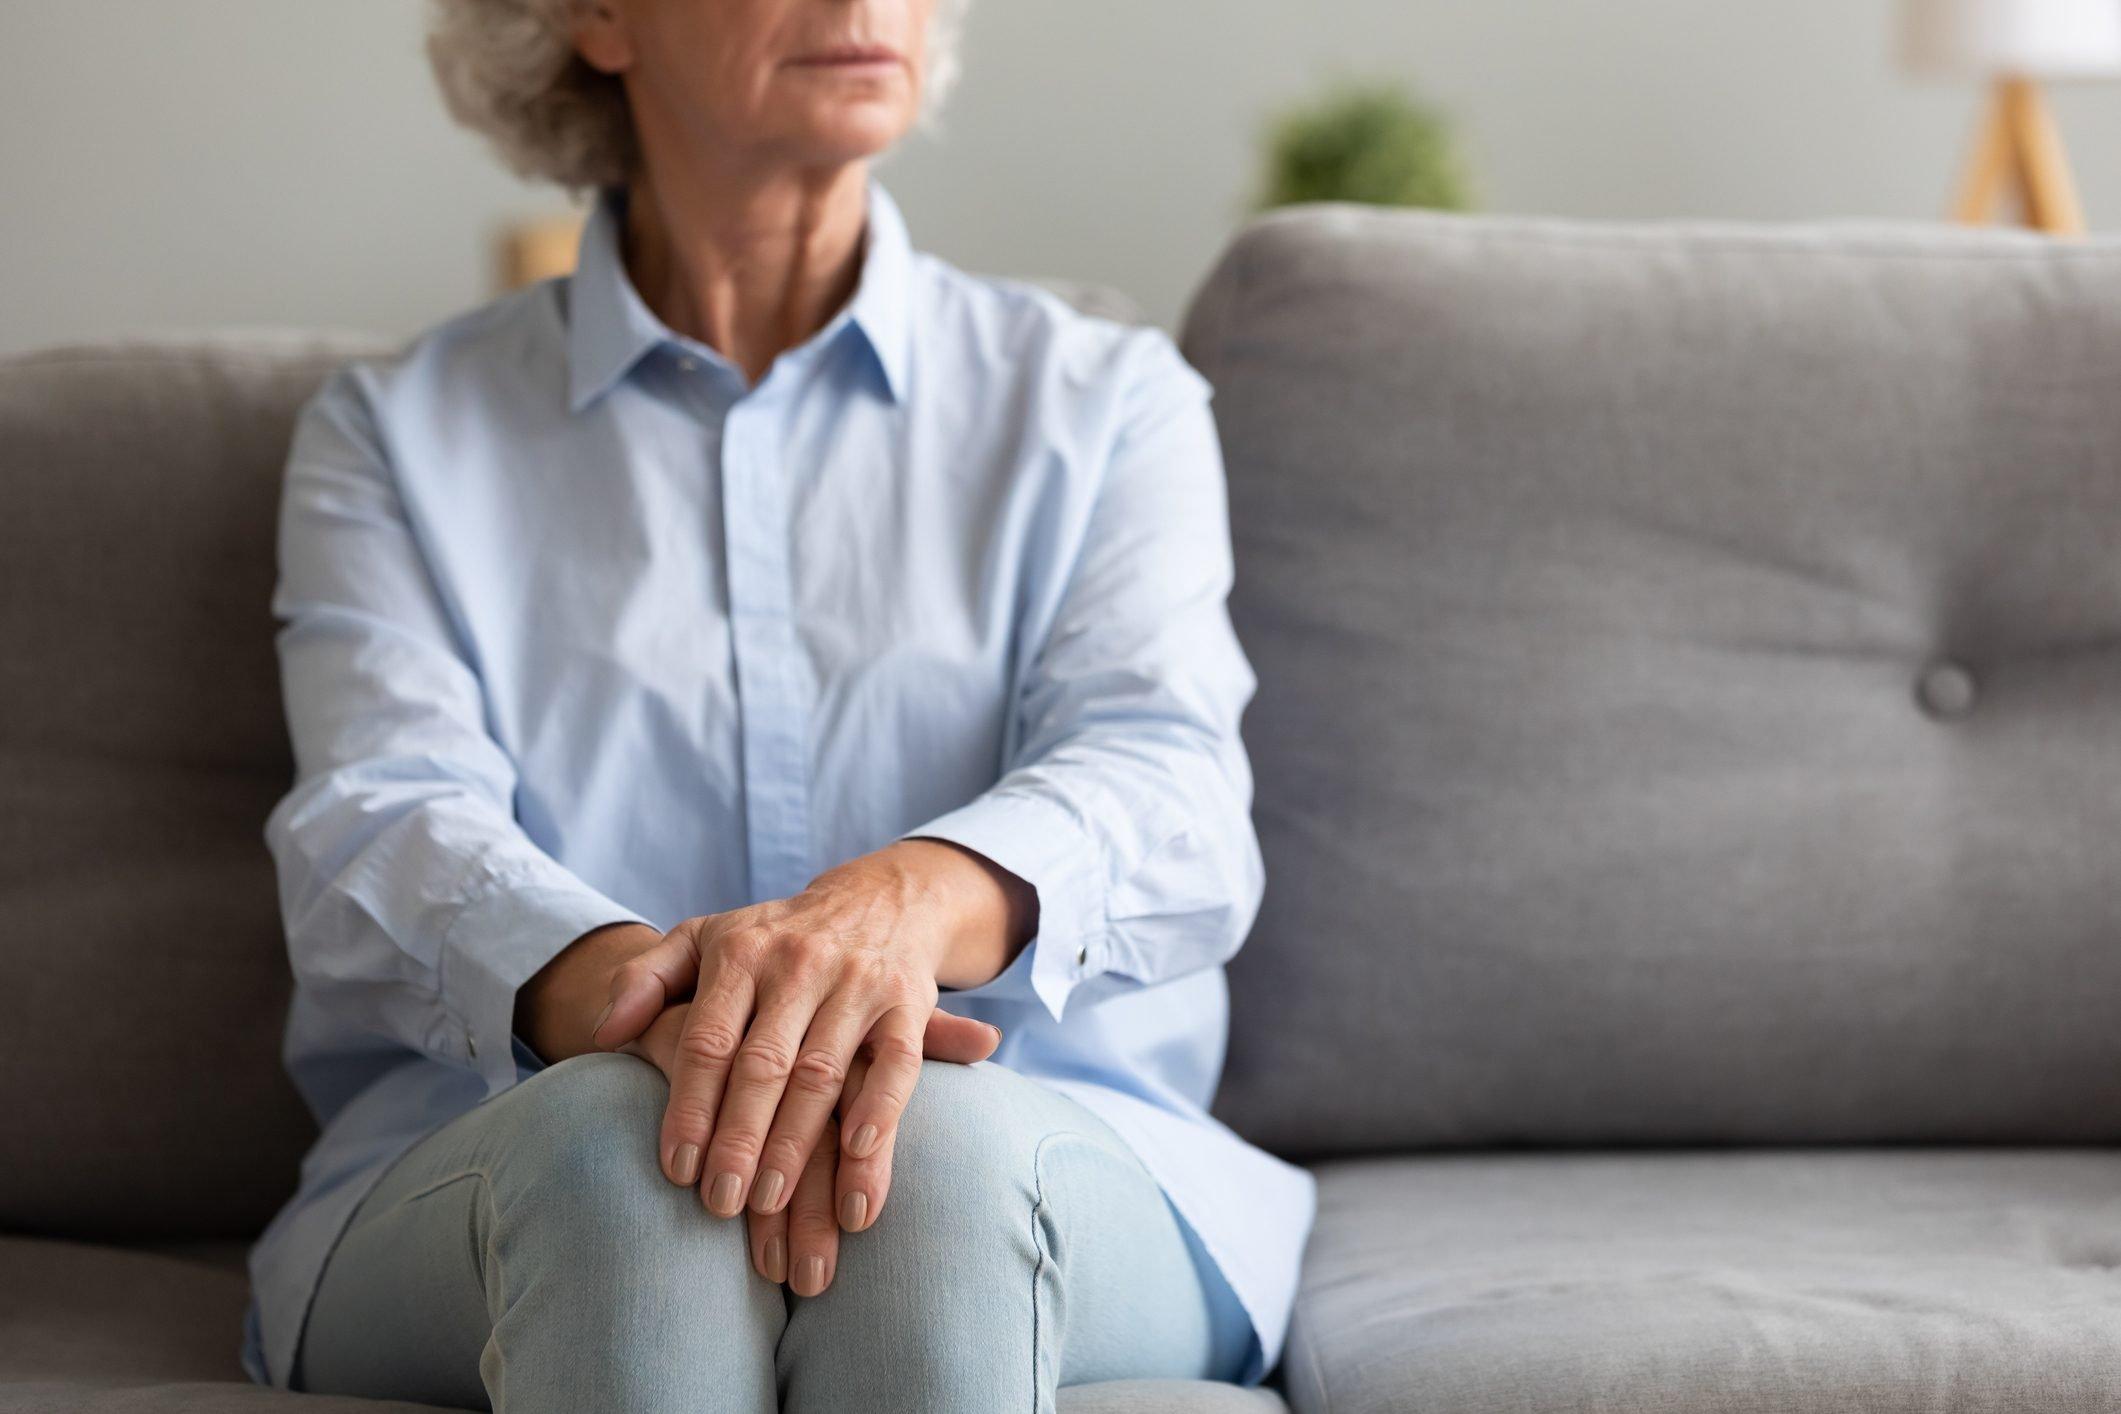 Unhappy depressed senior woman sit alone on sofa, closeup view